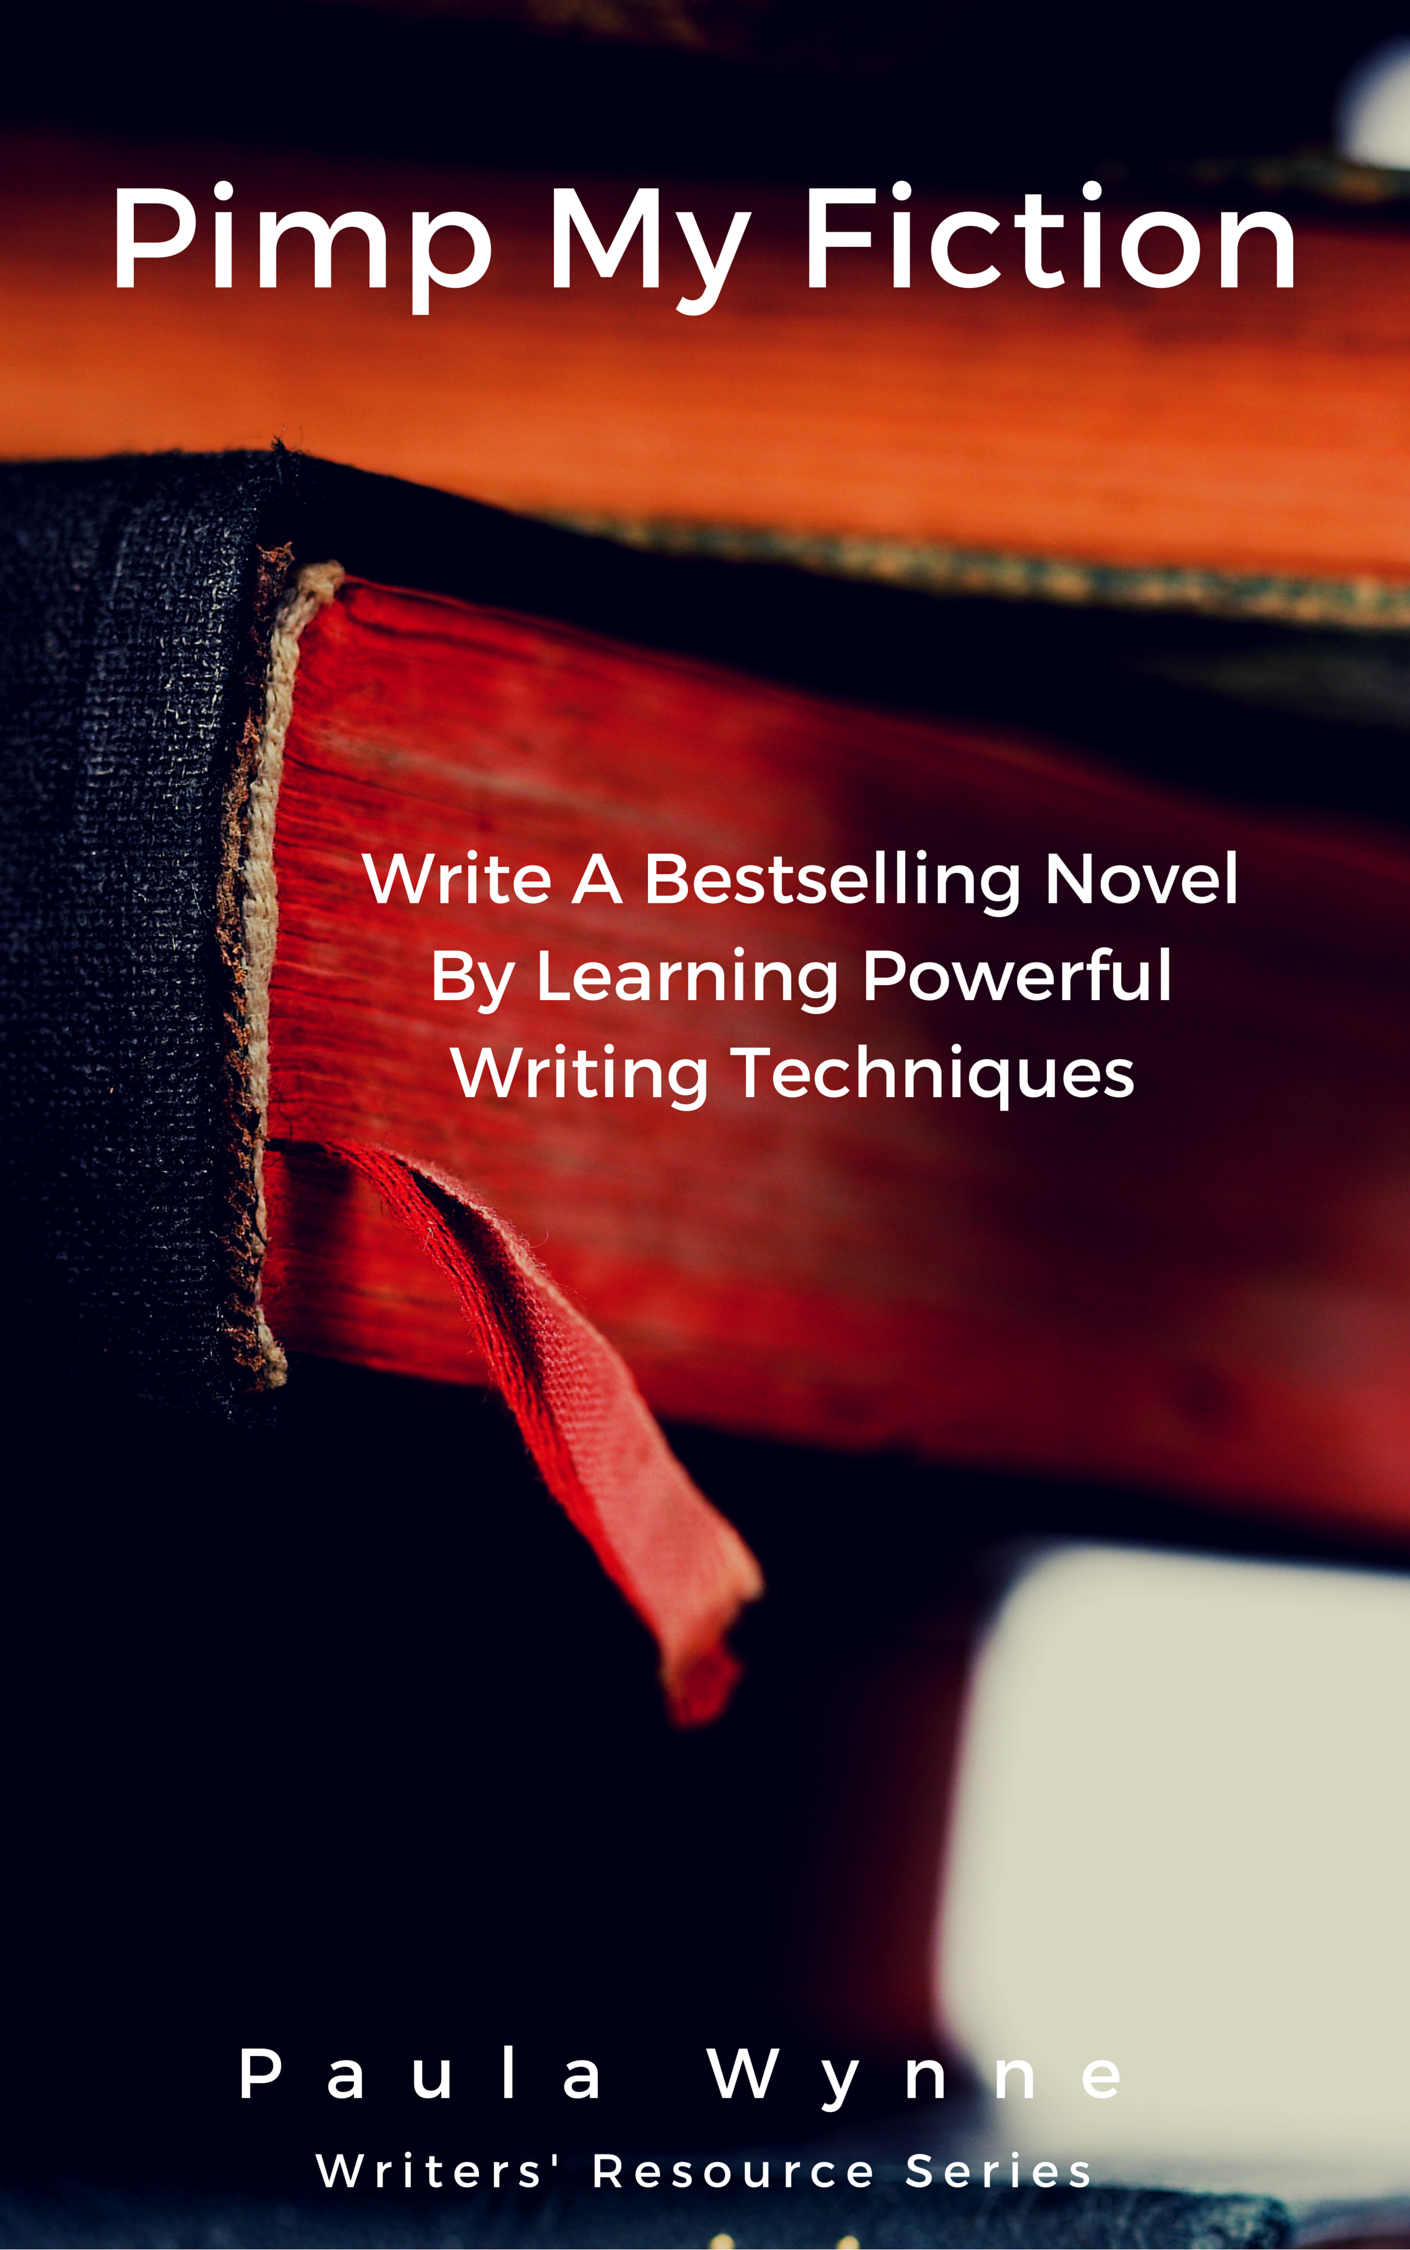 smashwords \u2013 pimp my fiction write a bestselling novel by learningpimp my fiction write a bestselling novel